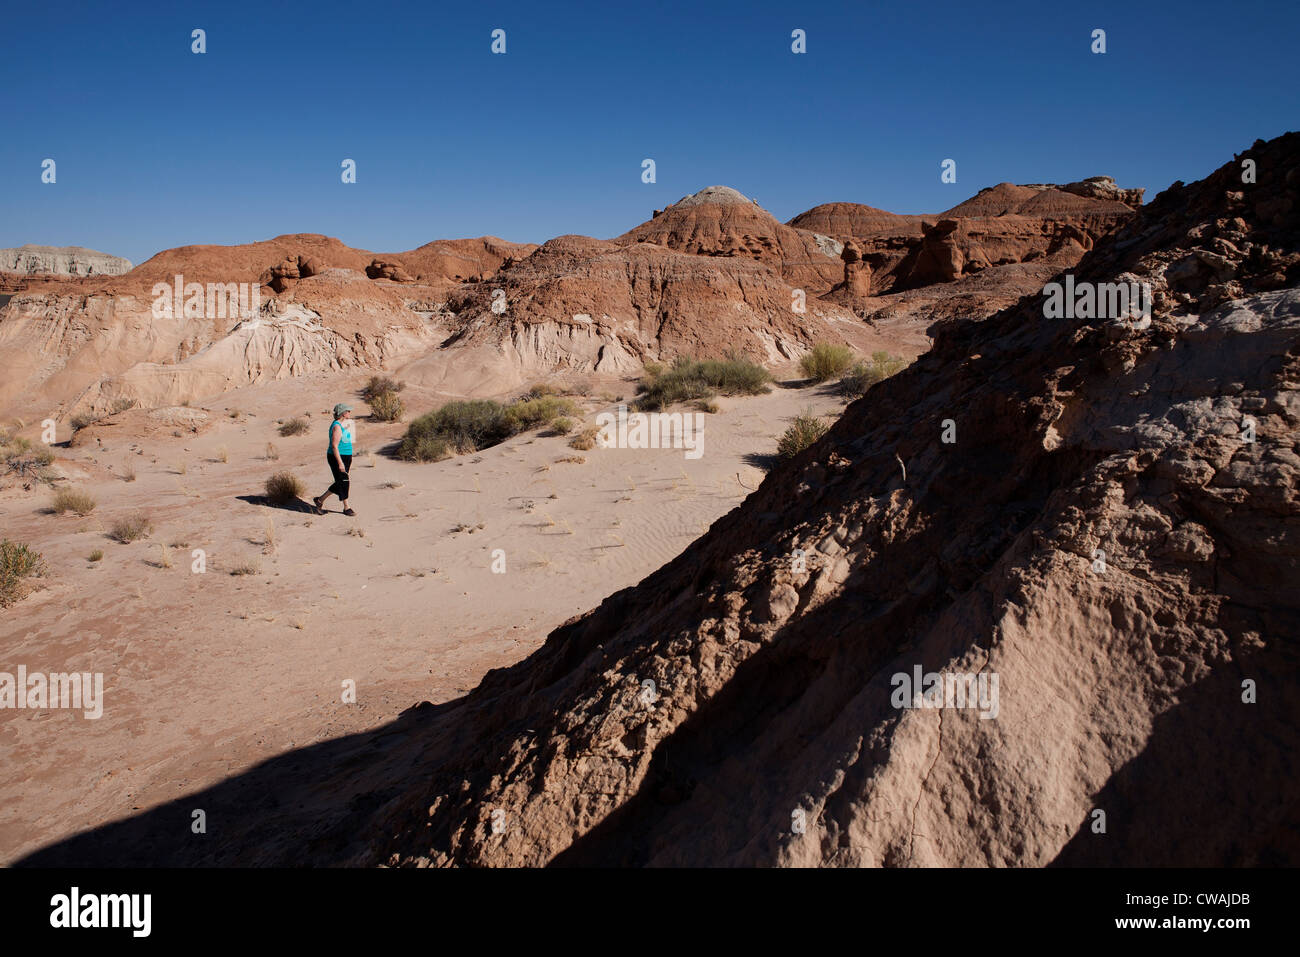 Woman walking in the desert of Goblin Valley State Park,Emery, Utah, USA - Stock Image